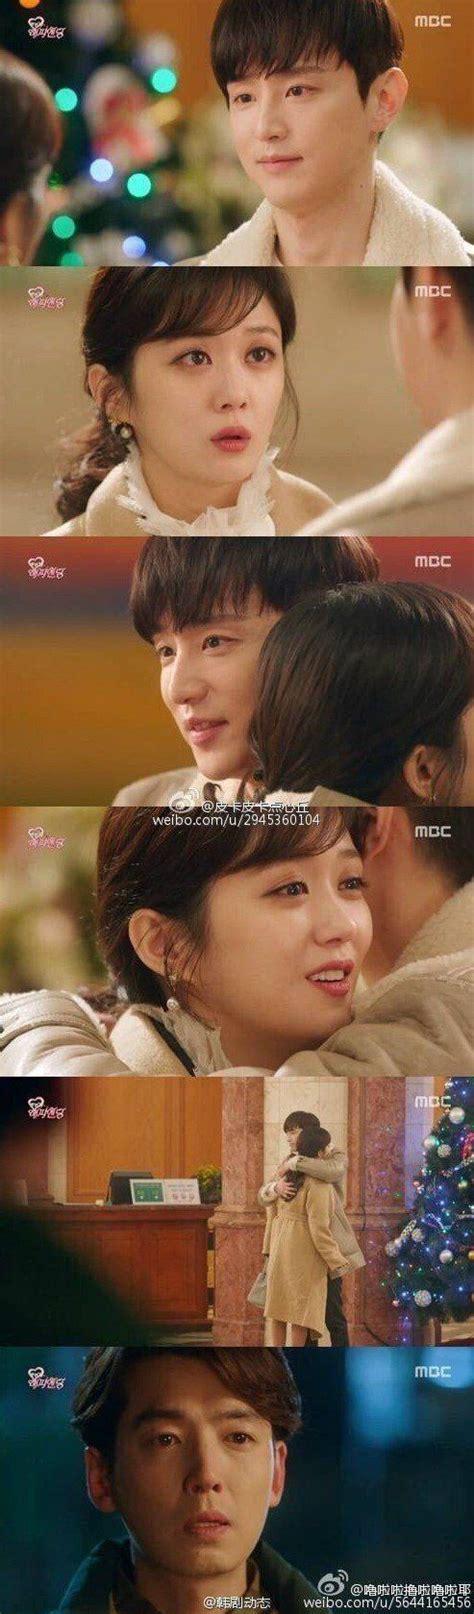 daftar film korea romantis happy ending 1000 images about happy ending again on pinterest